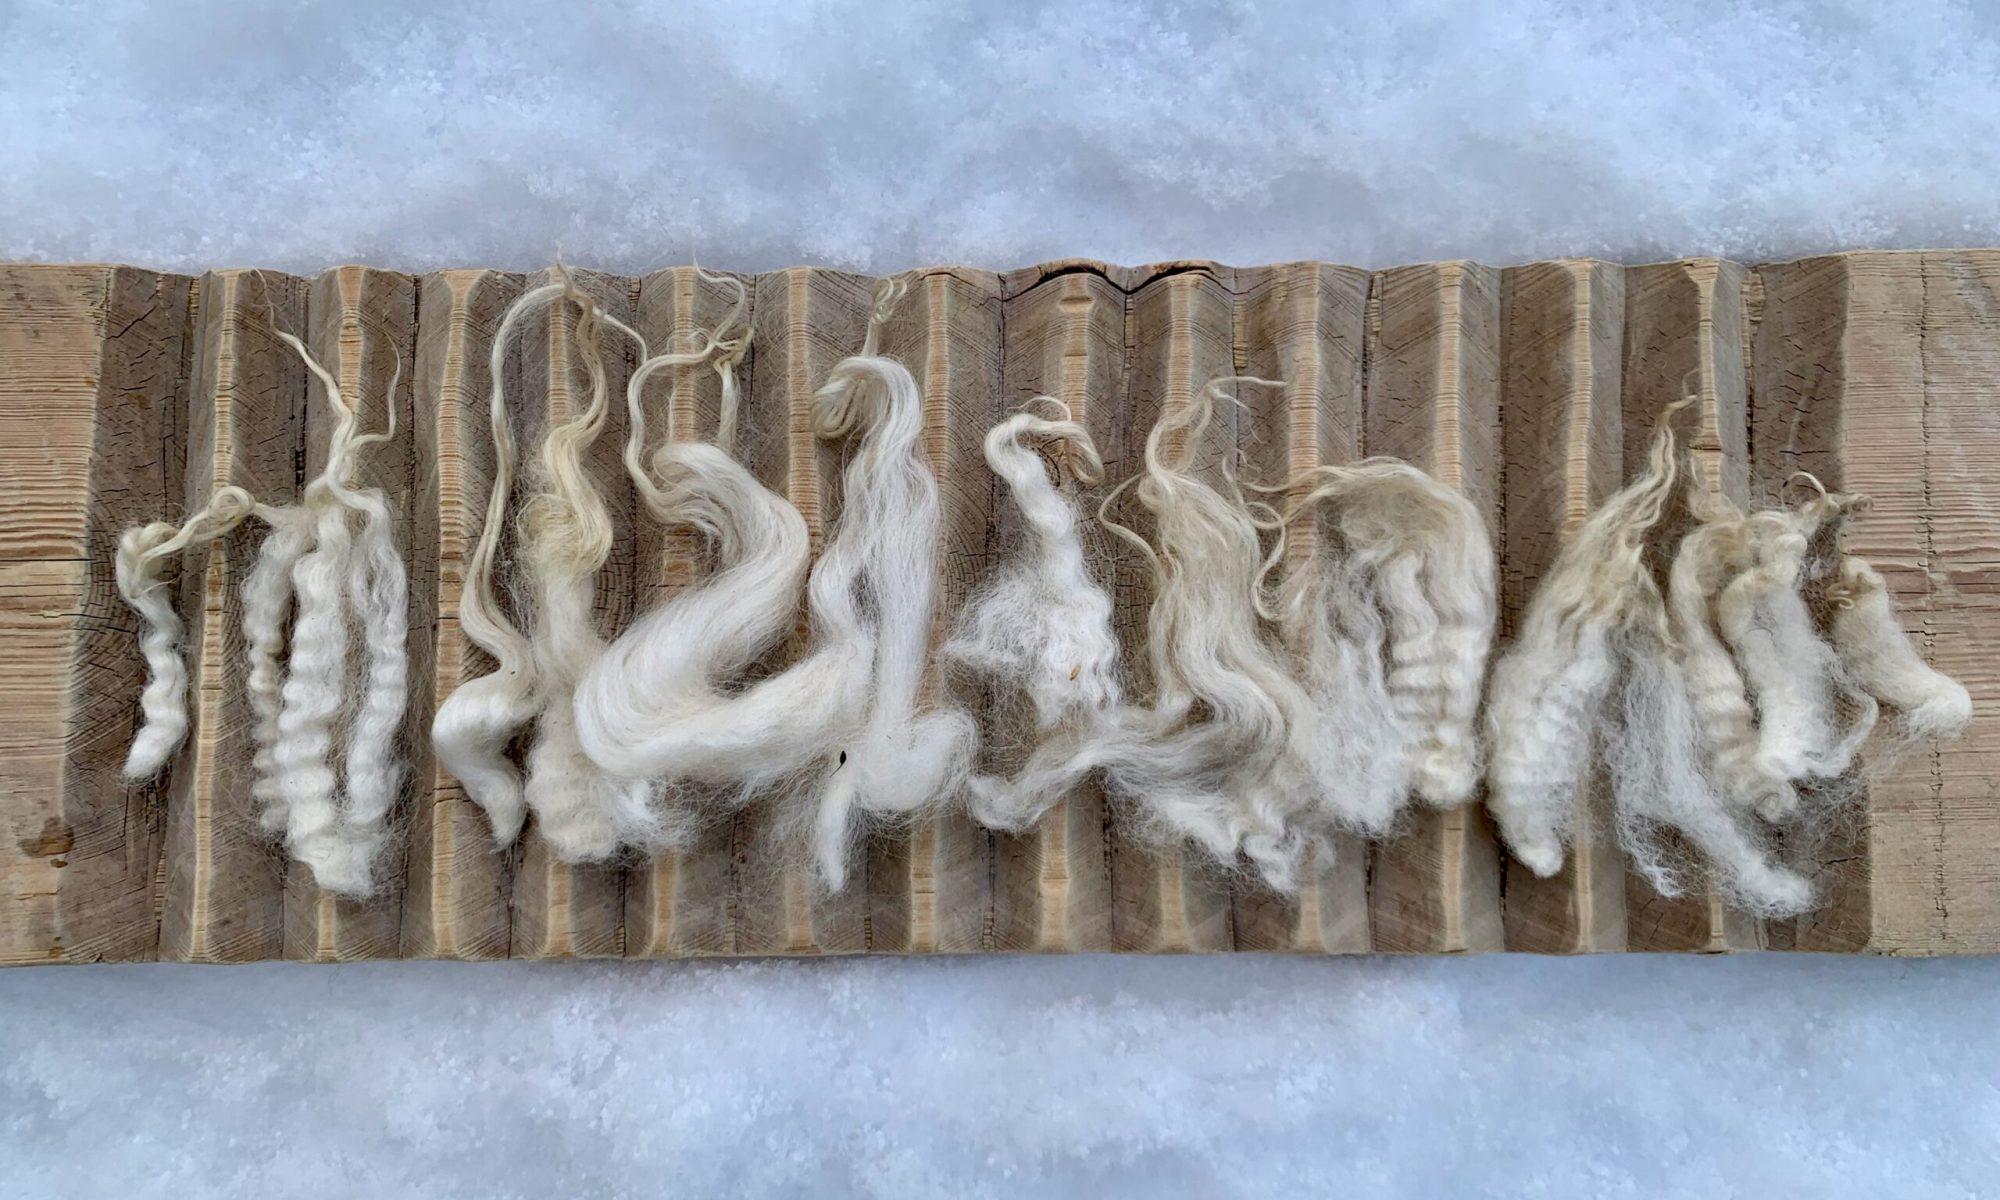 Pälsull, rya, vadmal and finull type wool frame one Värmland fleece.